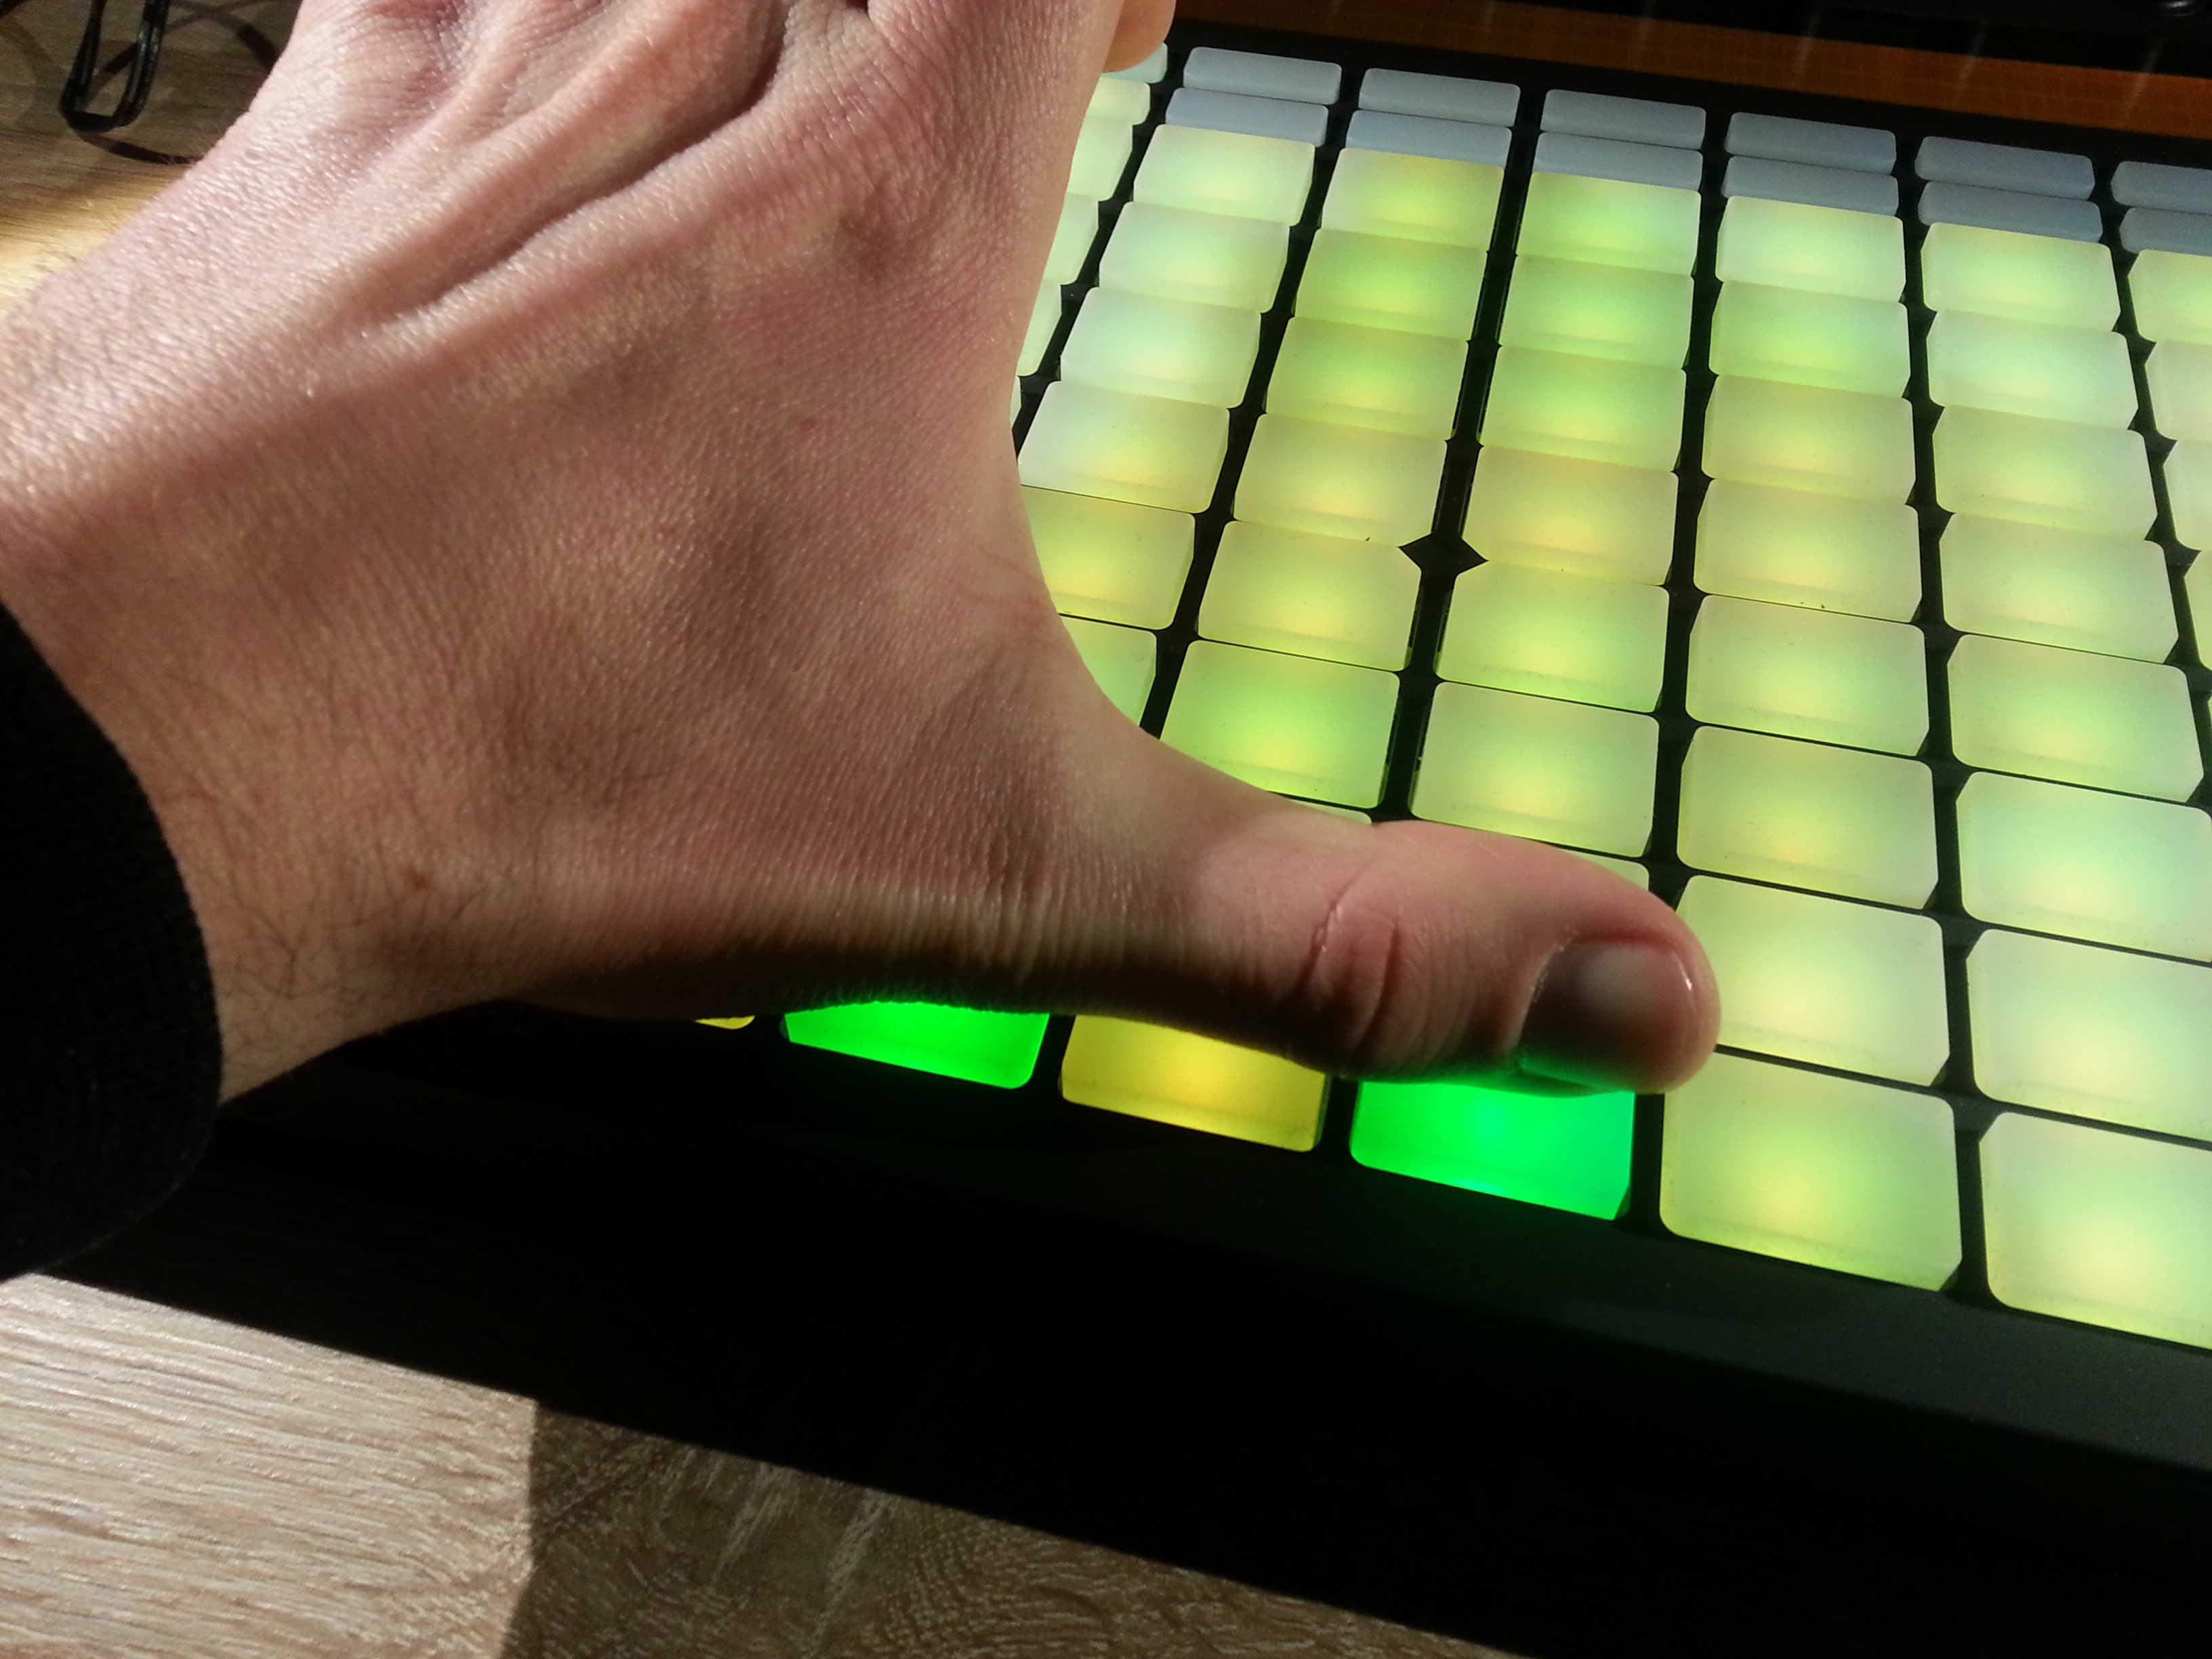 Ableton Push Thumb Placement